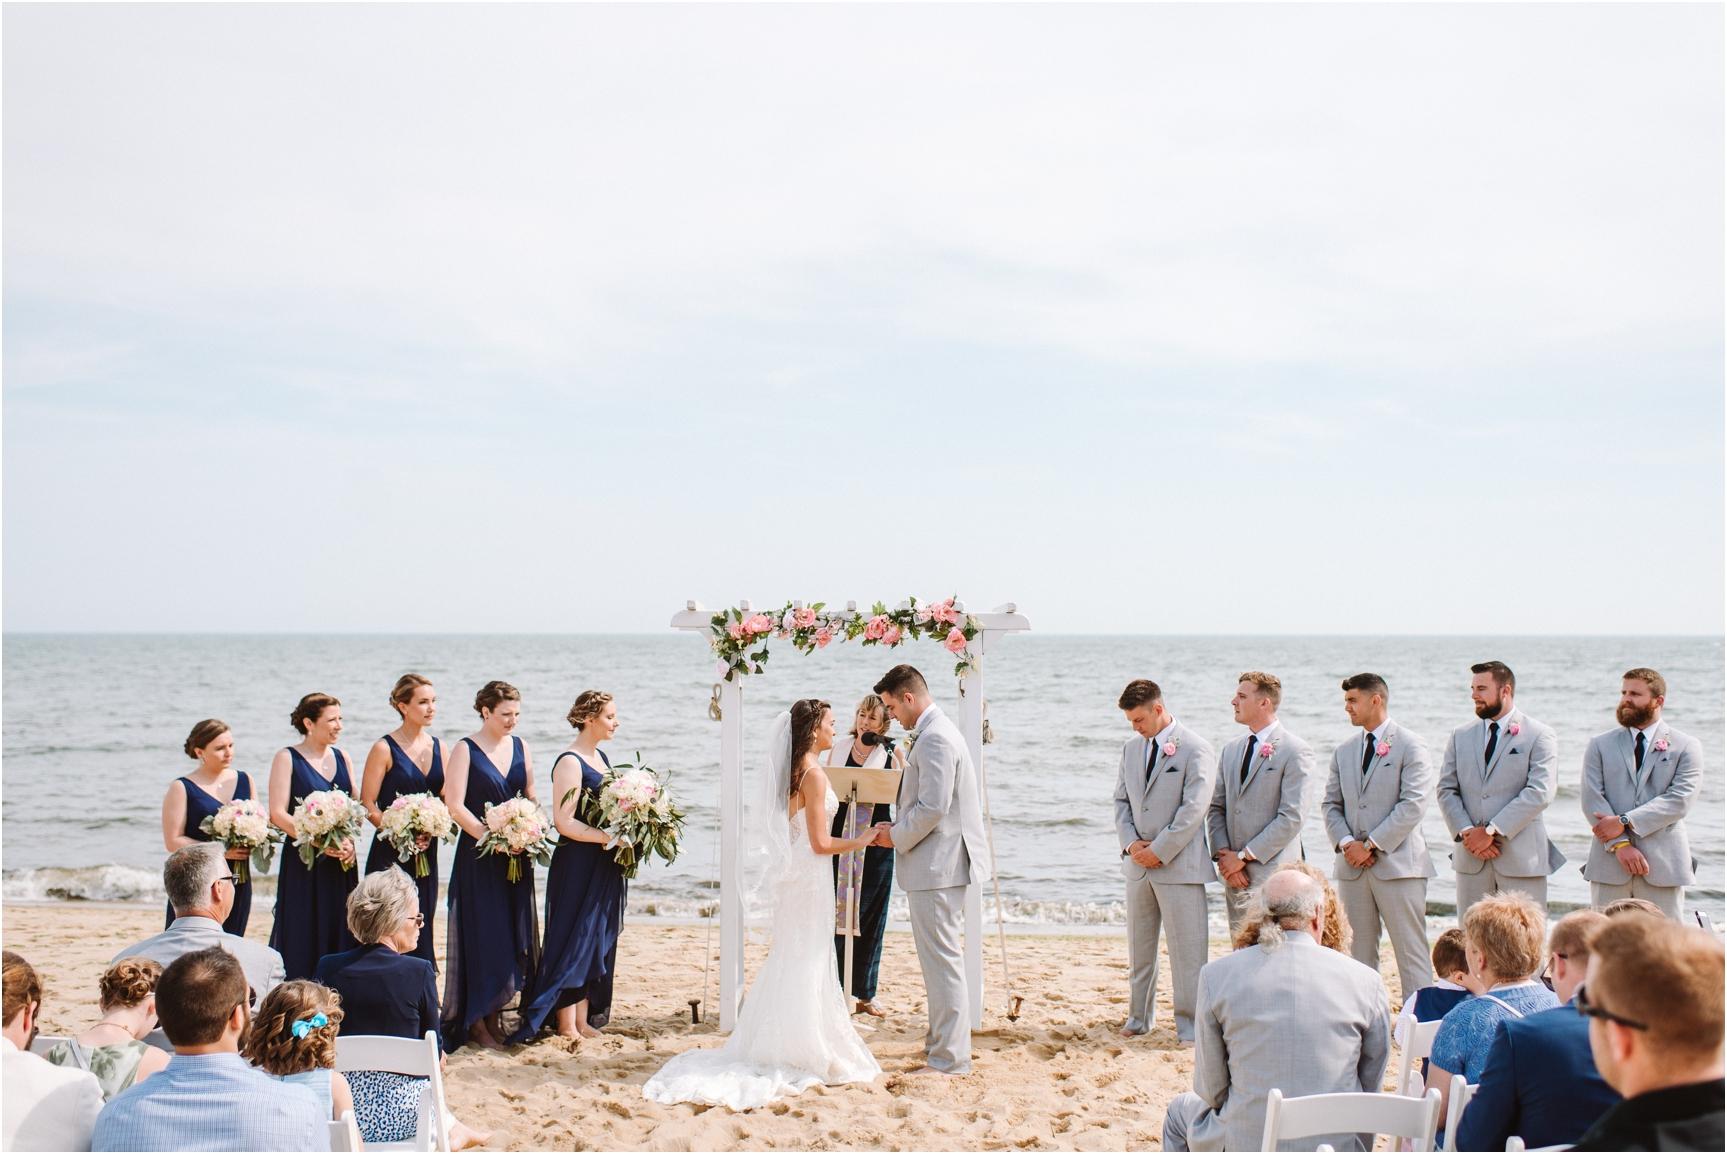 Sarah & Sam Pelham House Cape Cod Wedding Photographer-92.jpg